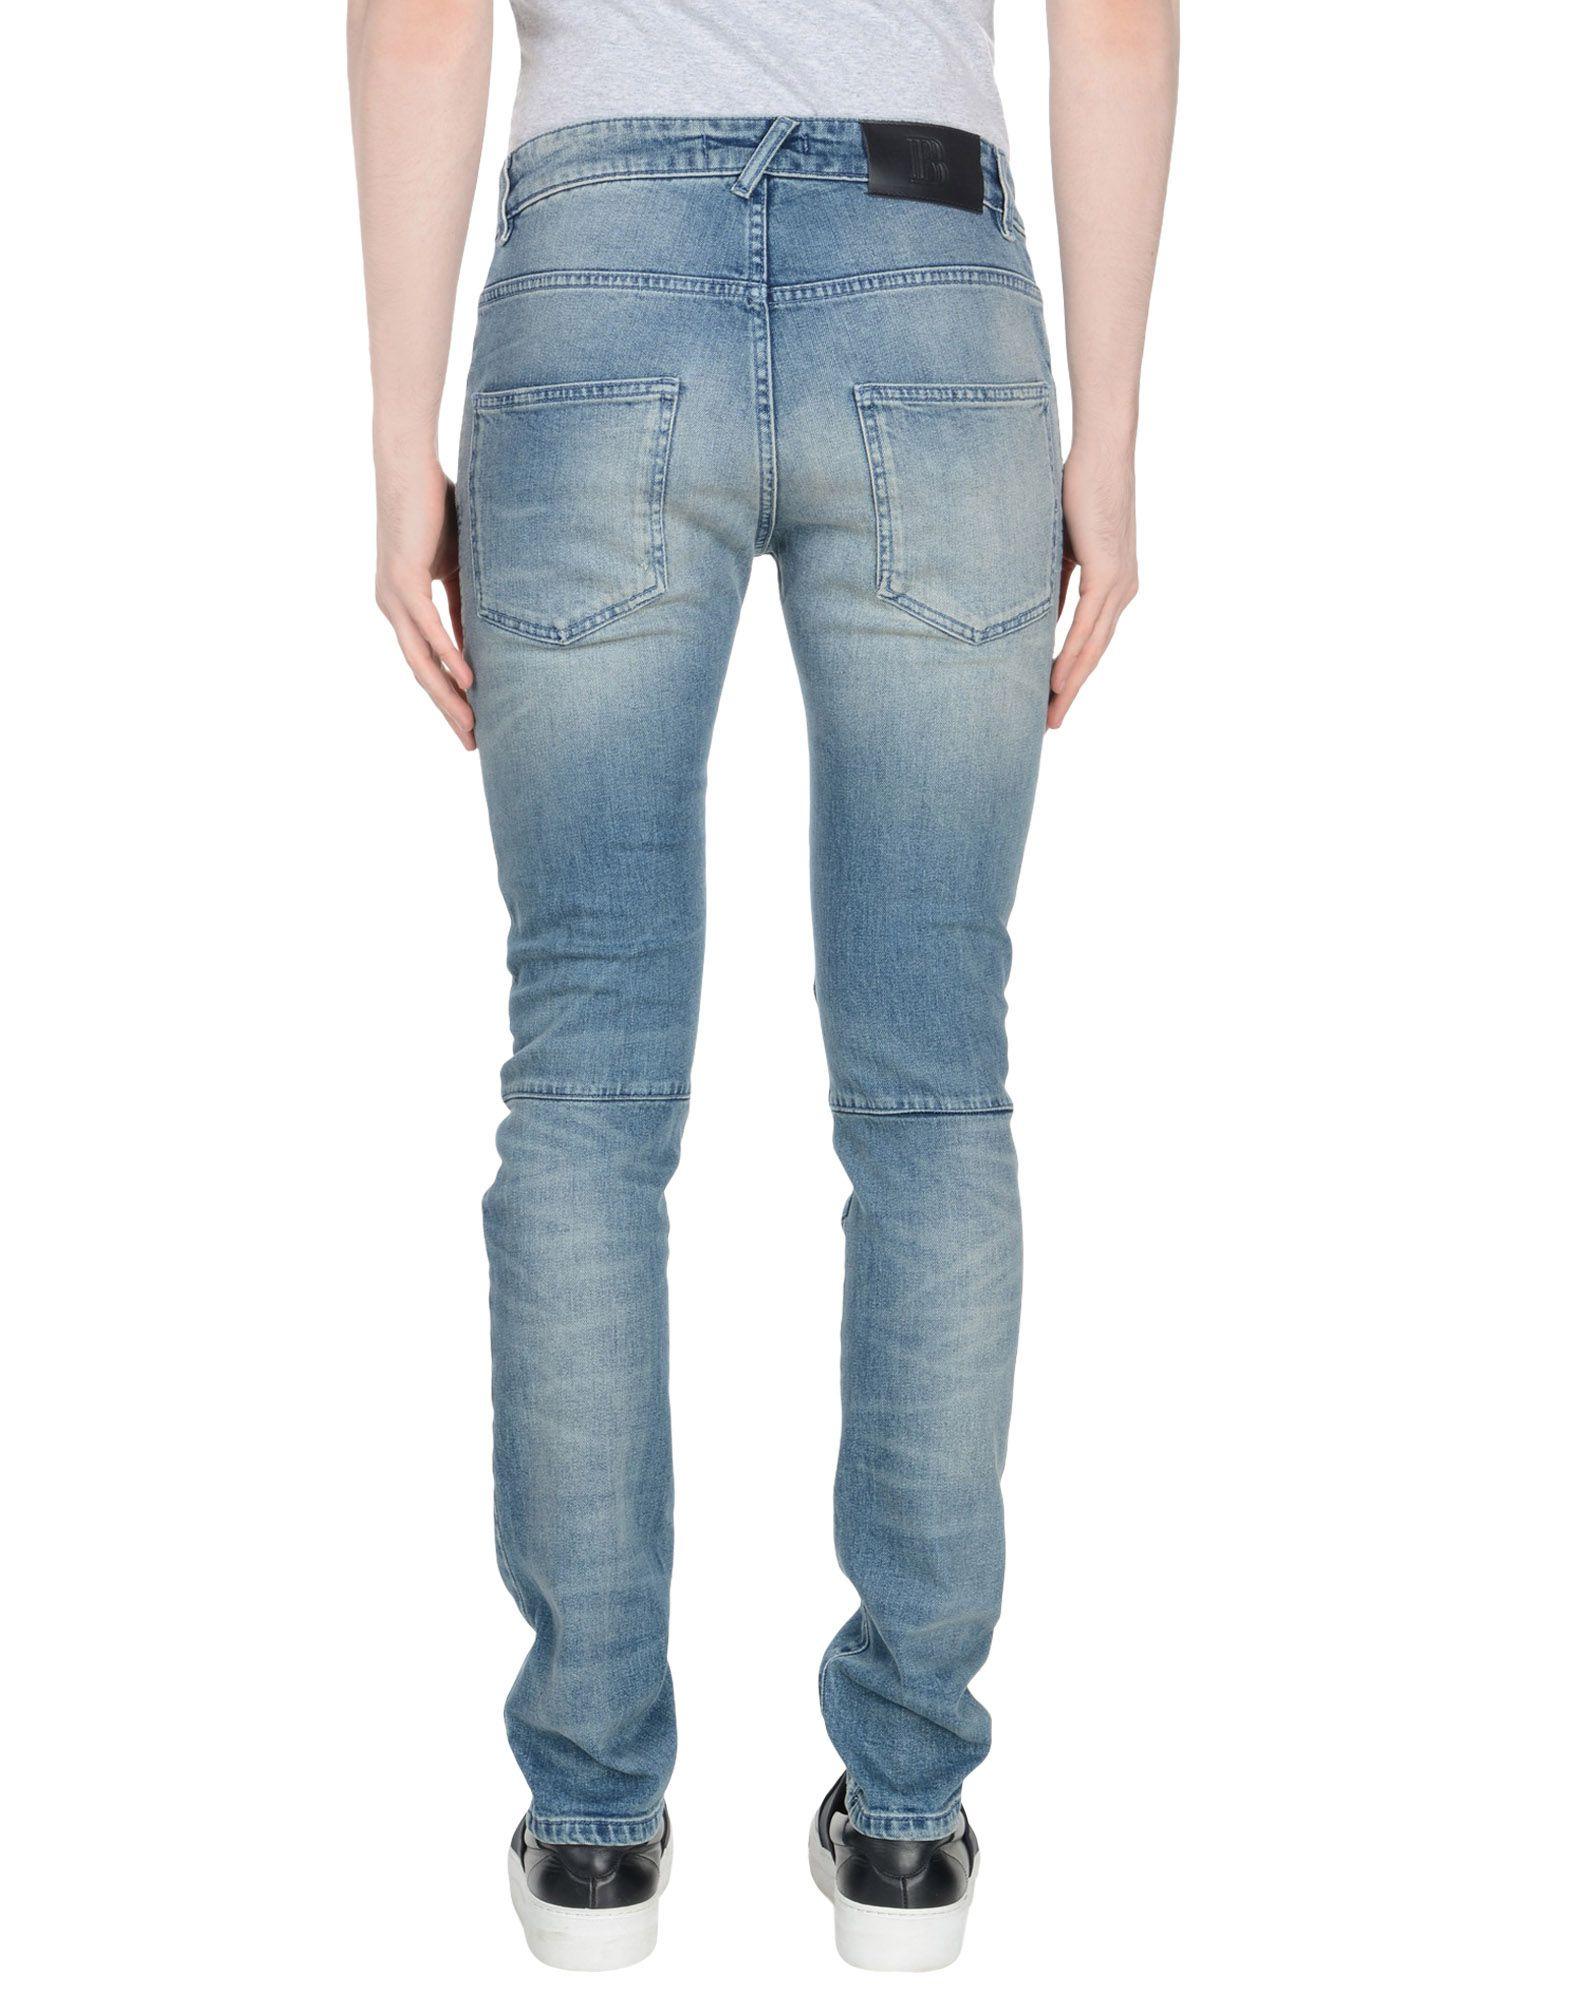 Pantaloni Jeans Pierre Balmain Uomo - 42665819TS 42665819TS 42665819TS 1055a4